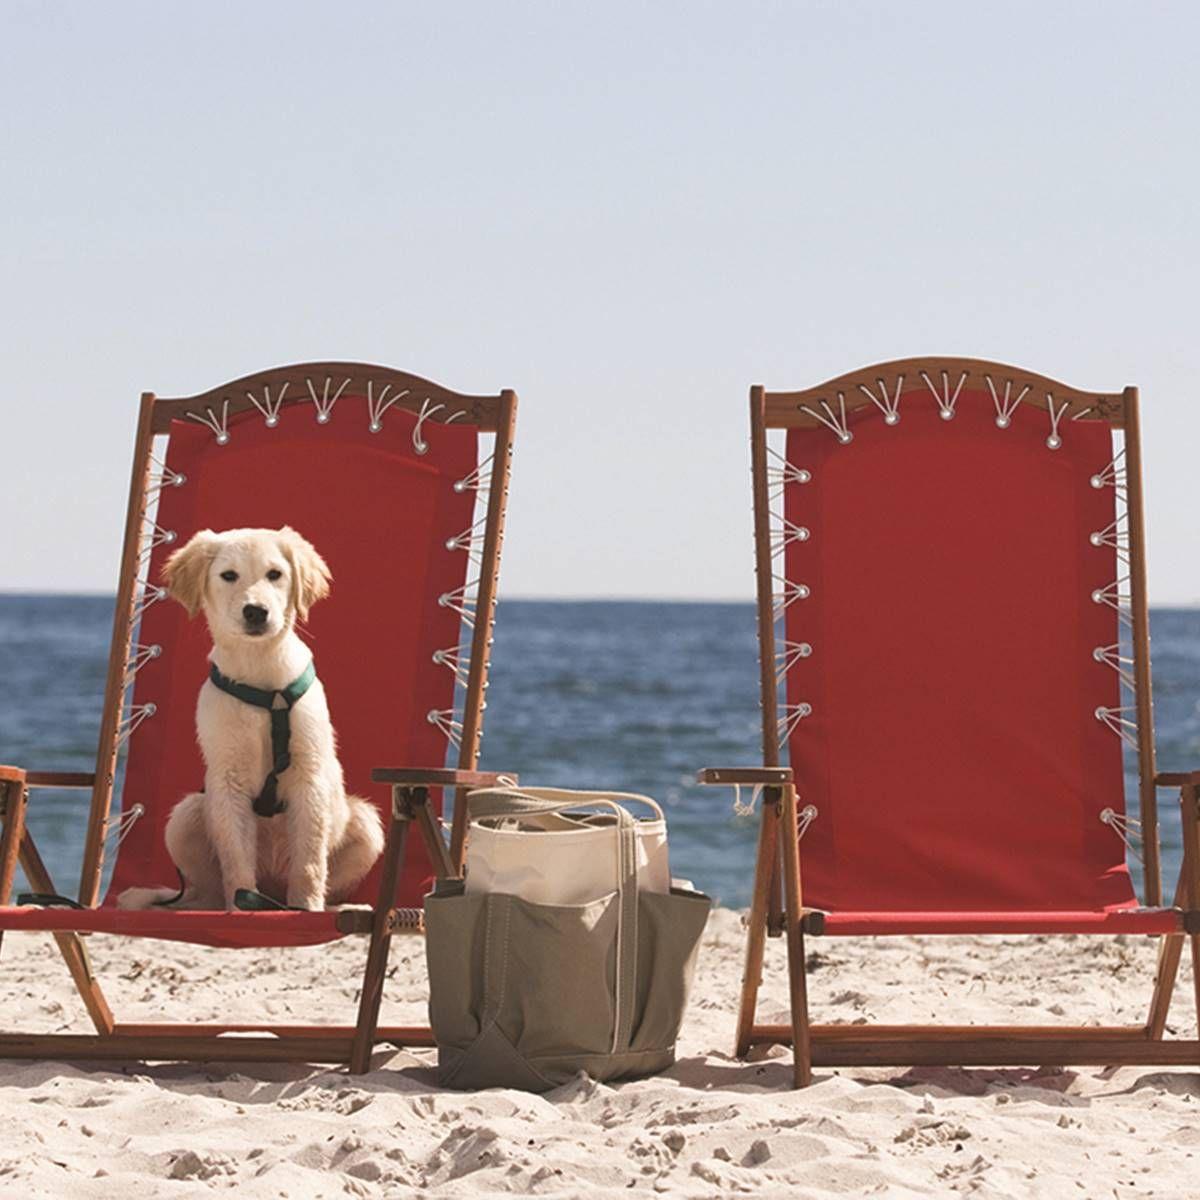 PetFriendly Maine Beach Resort  Inn By The Sea Maine